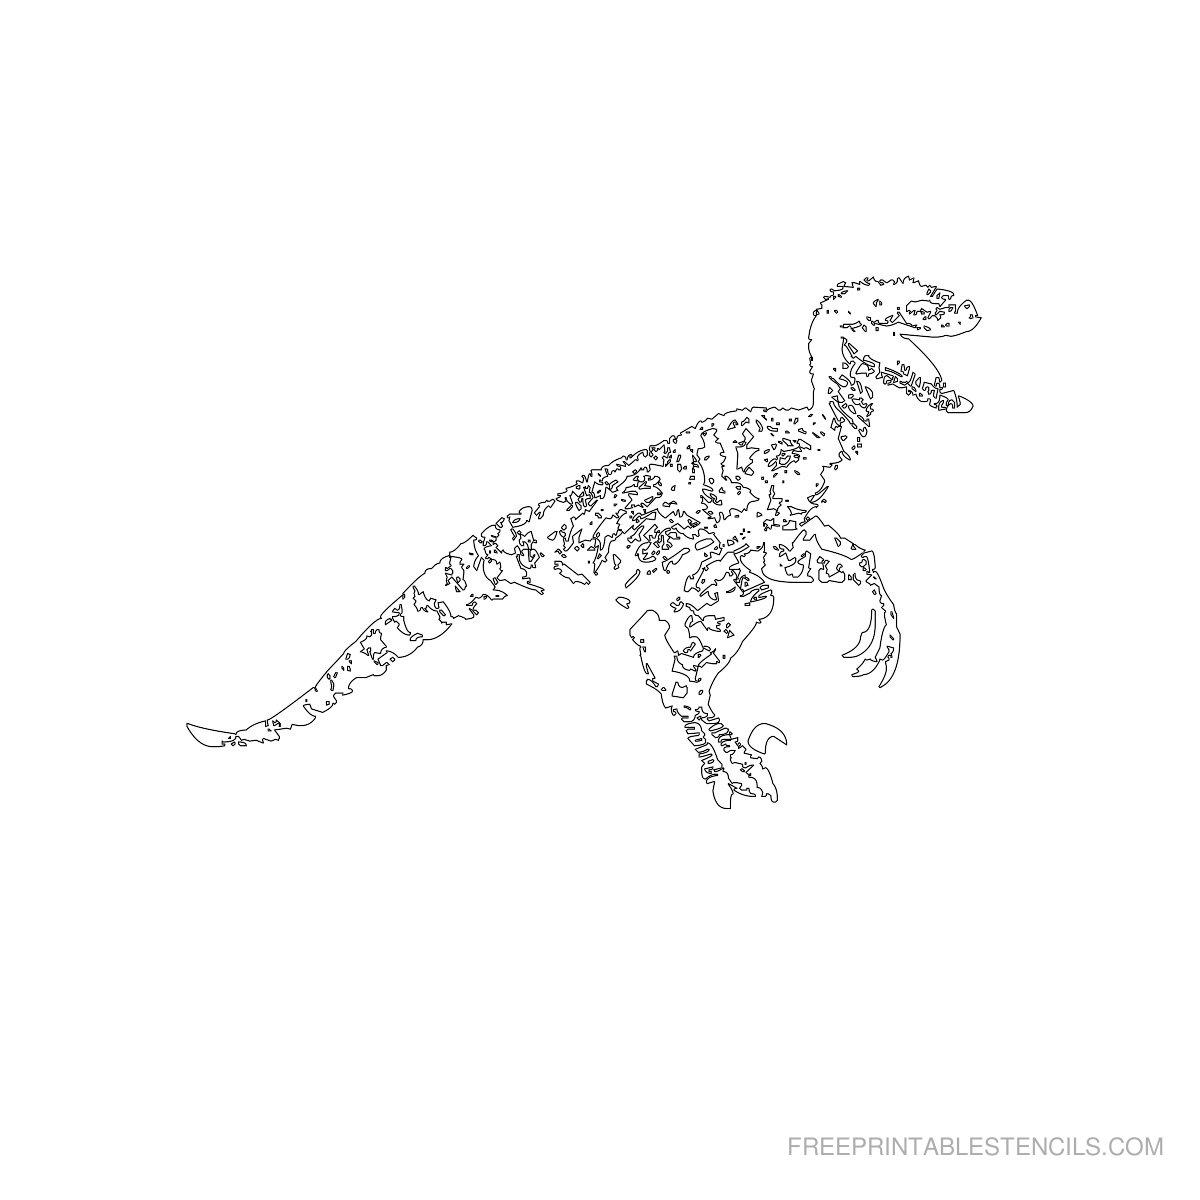 Free Printable Dinosaur Stencil B